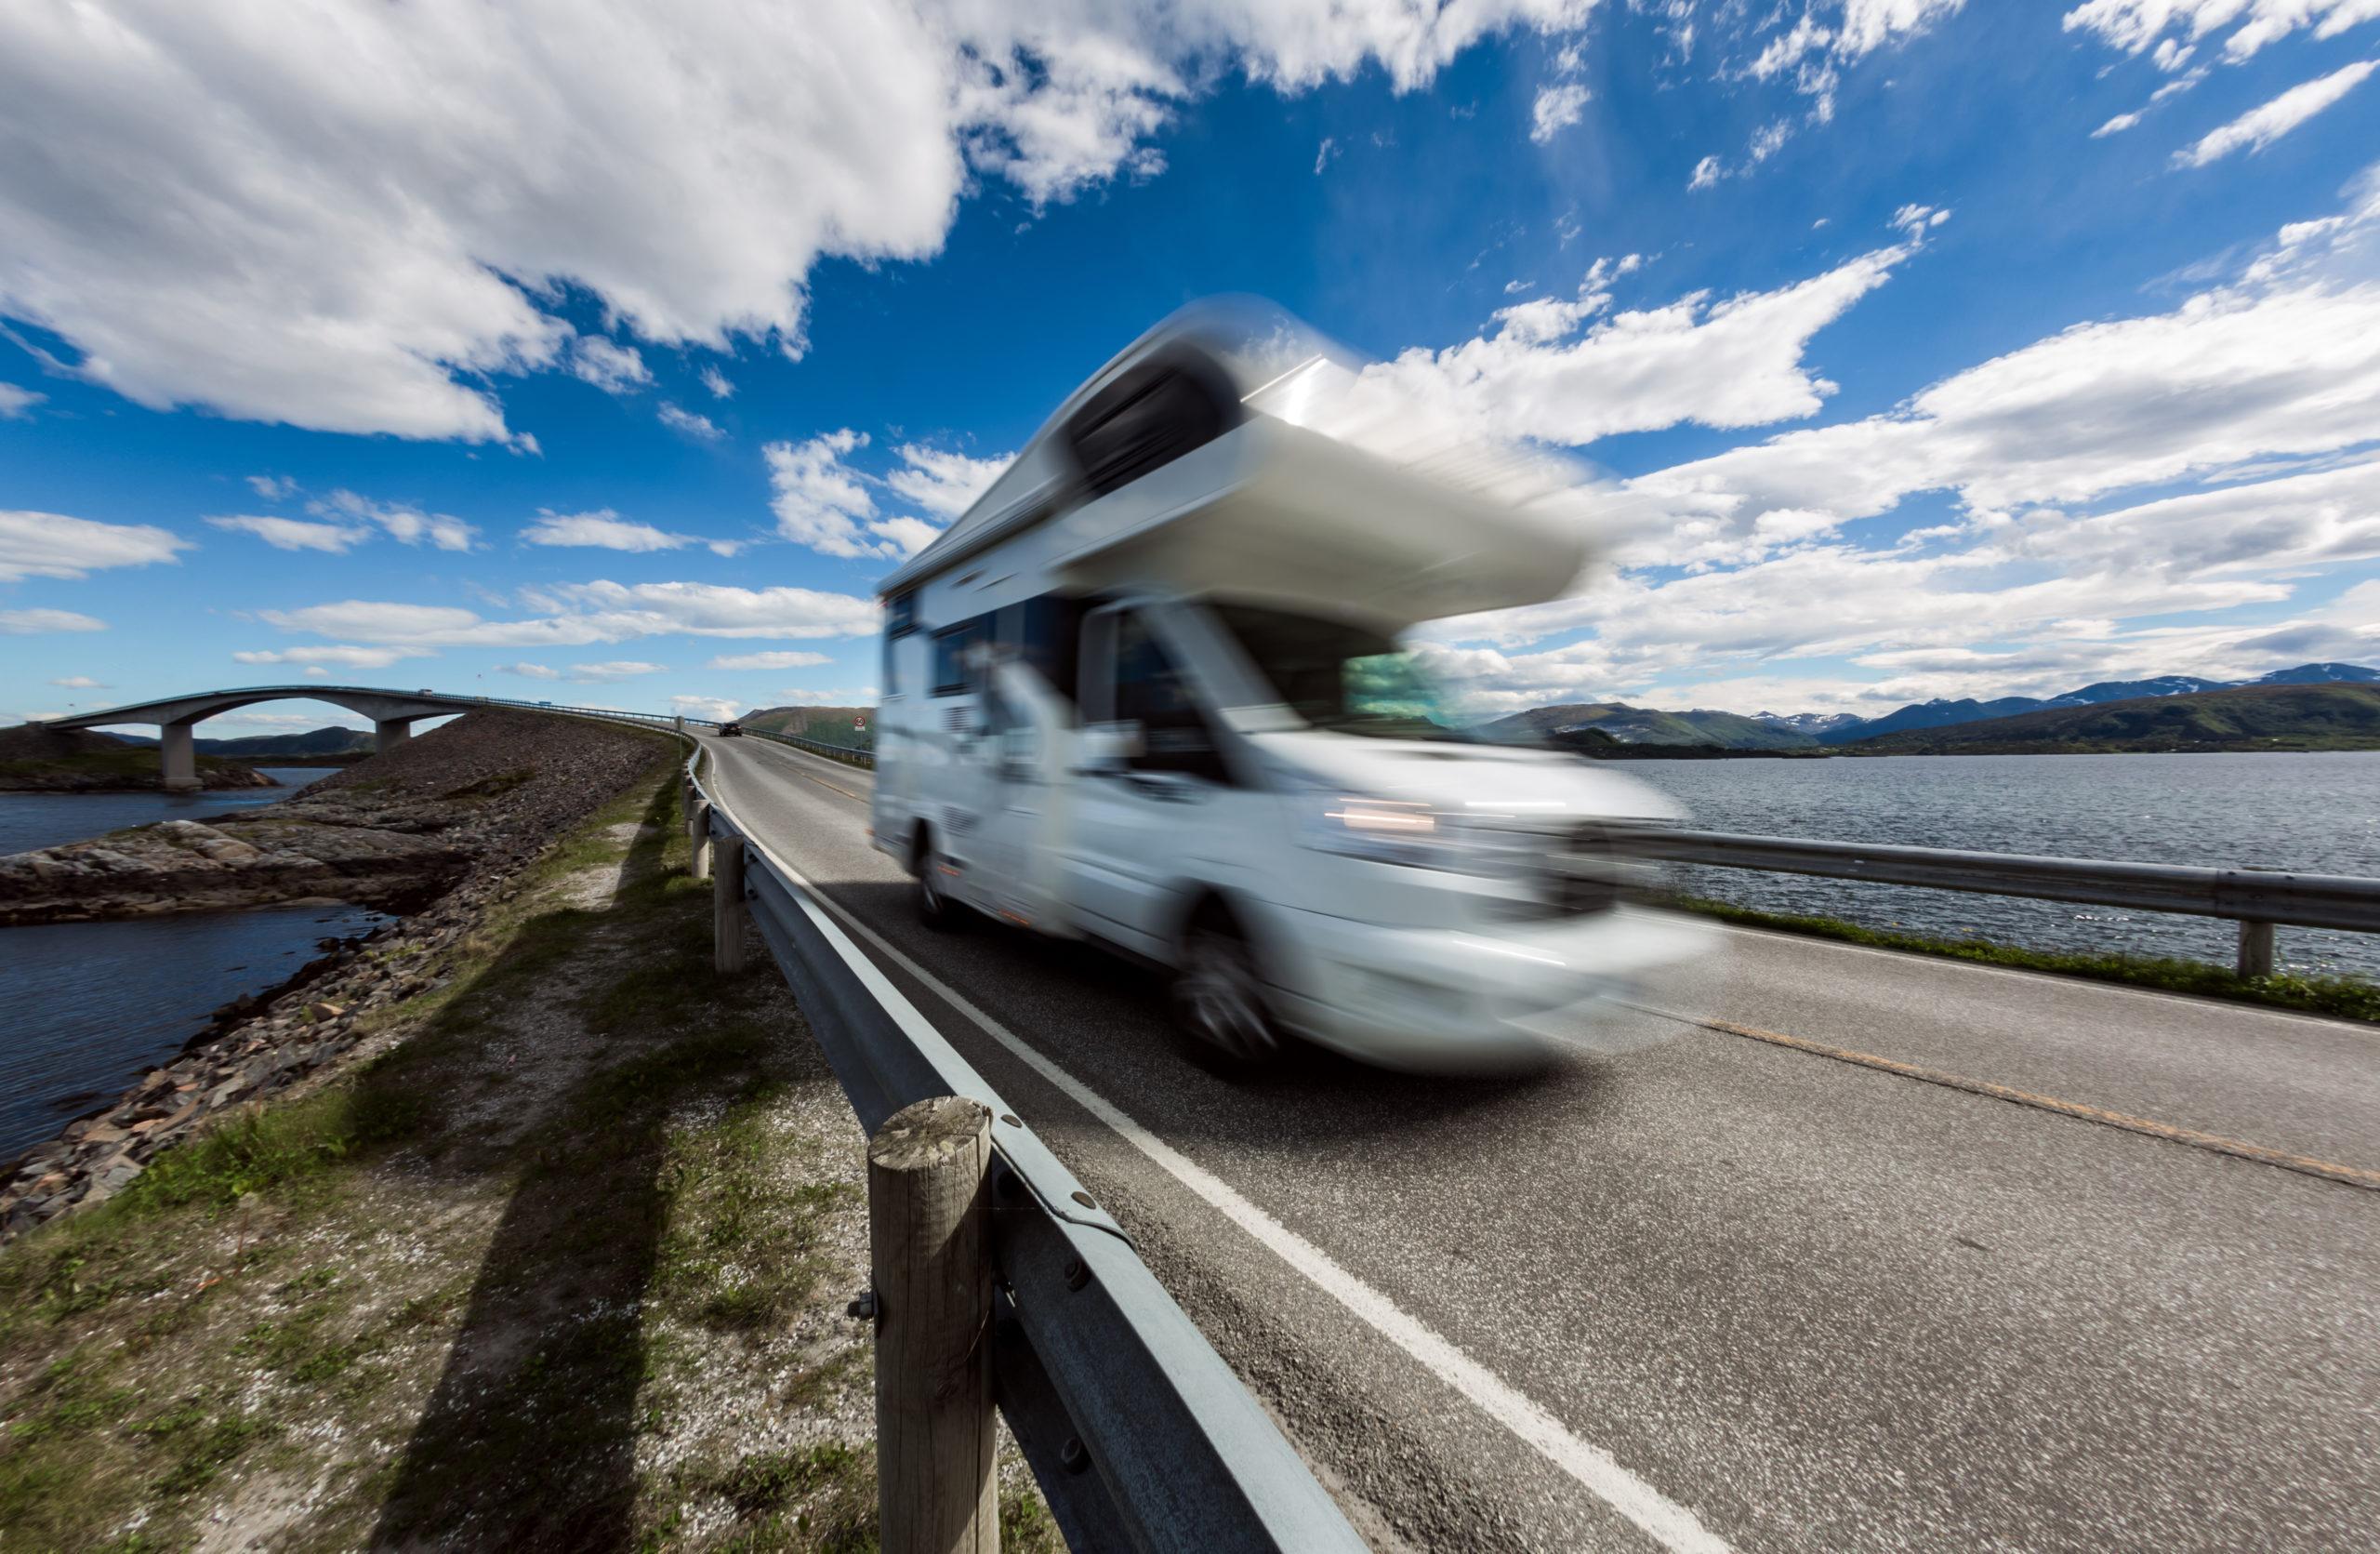 Alquiler de autocaravanas ruta carretera